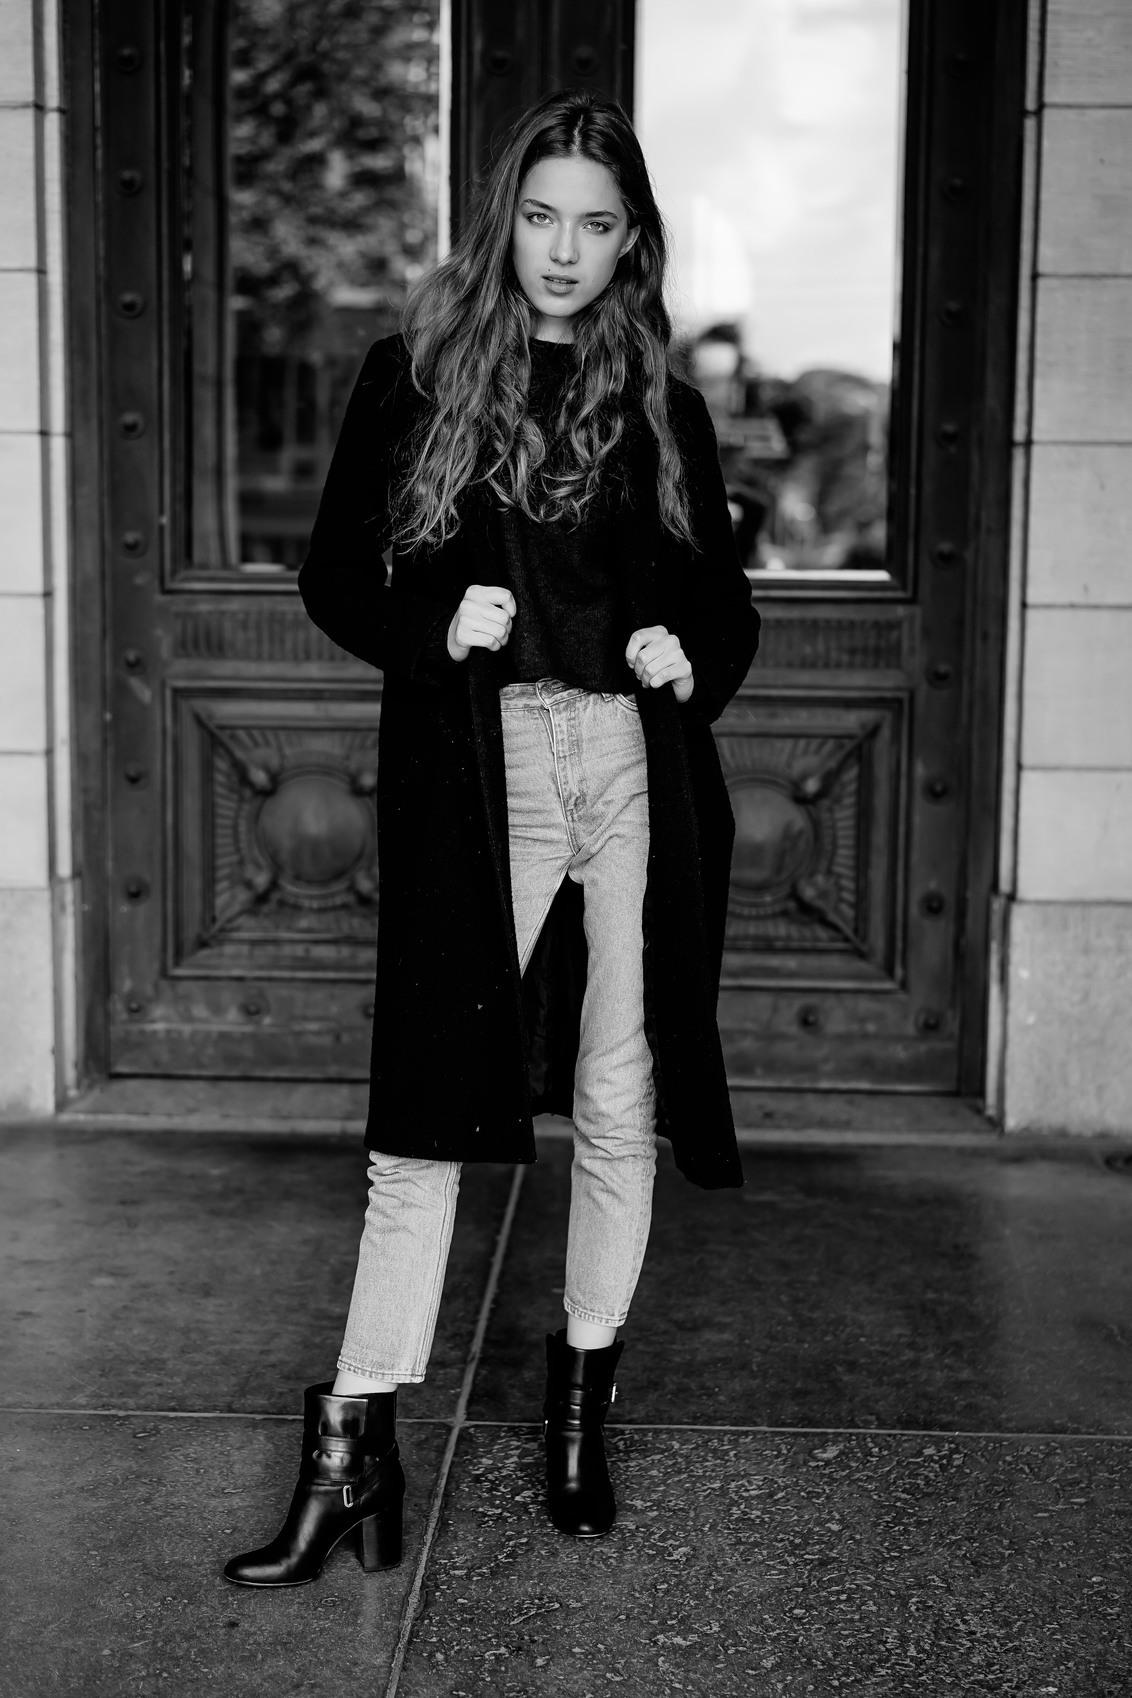 Maria - - - foto door Kayleesfotografie op 18-09-2017 - deze foto bevat: vrouw, licht, portret, model, fashion, vintage, beauty, zwartwit, pose, belichting, expressie, magazine, retro, bokeh, commercial, styling, editorial, fashionfotografie